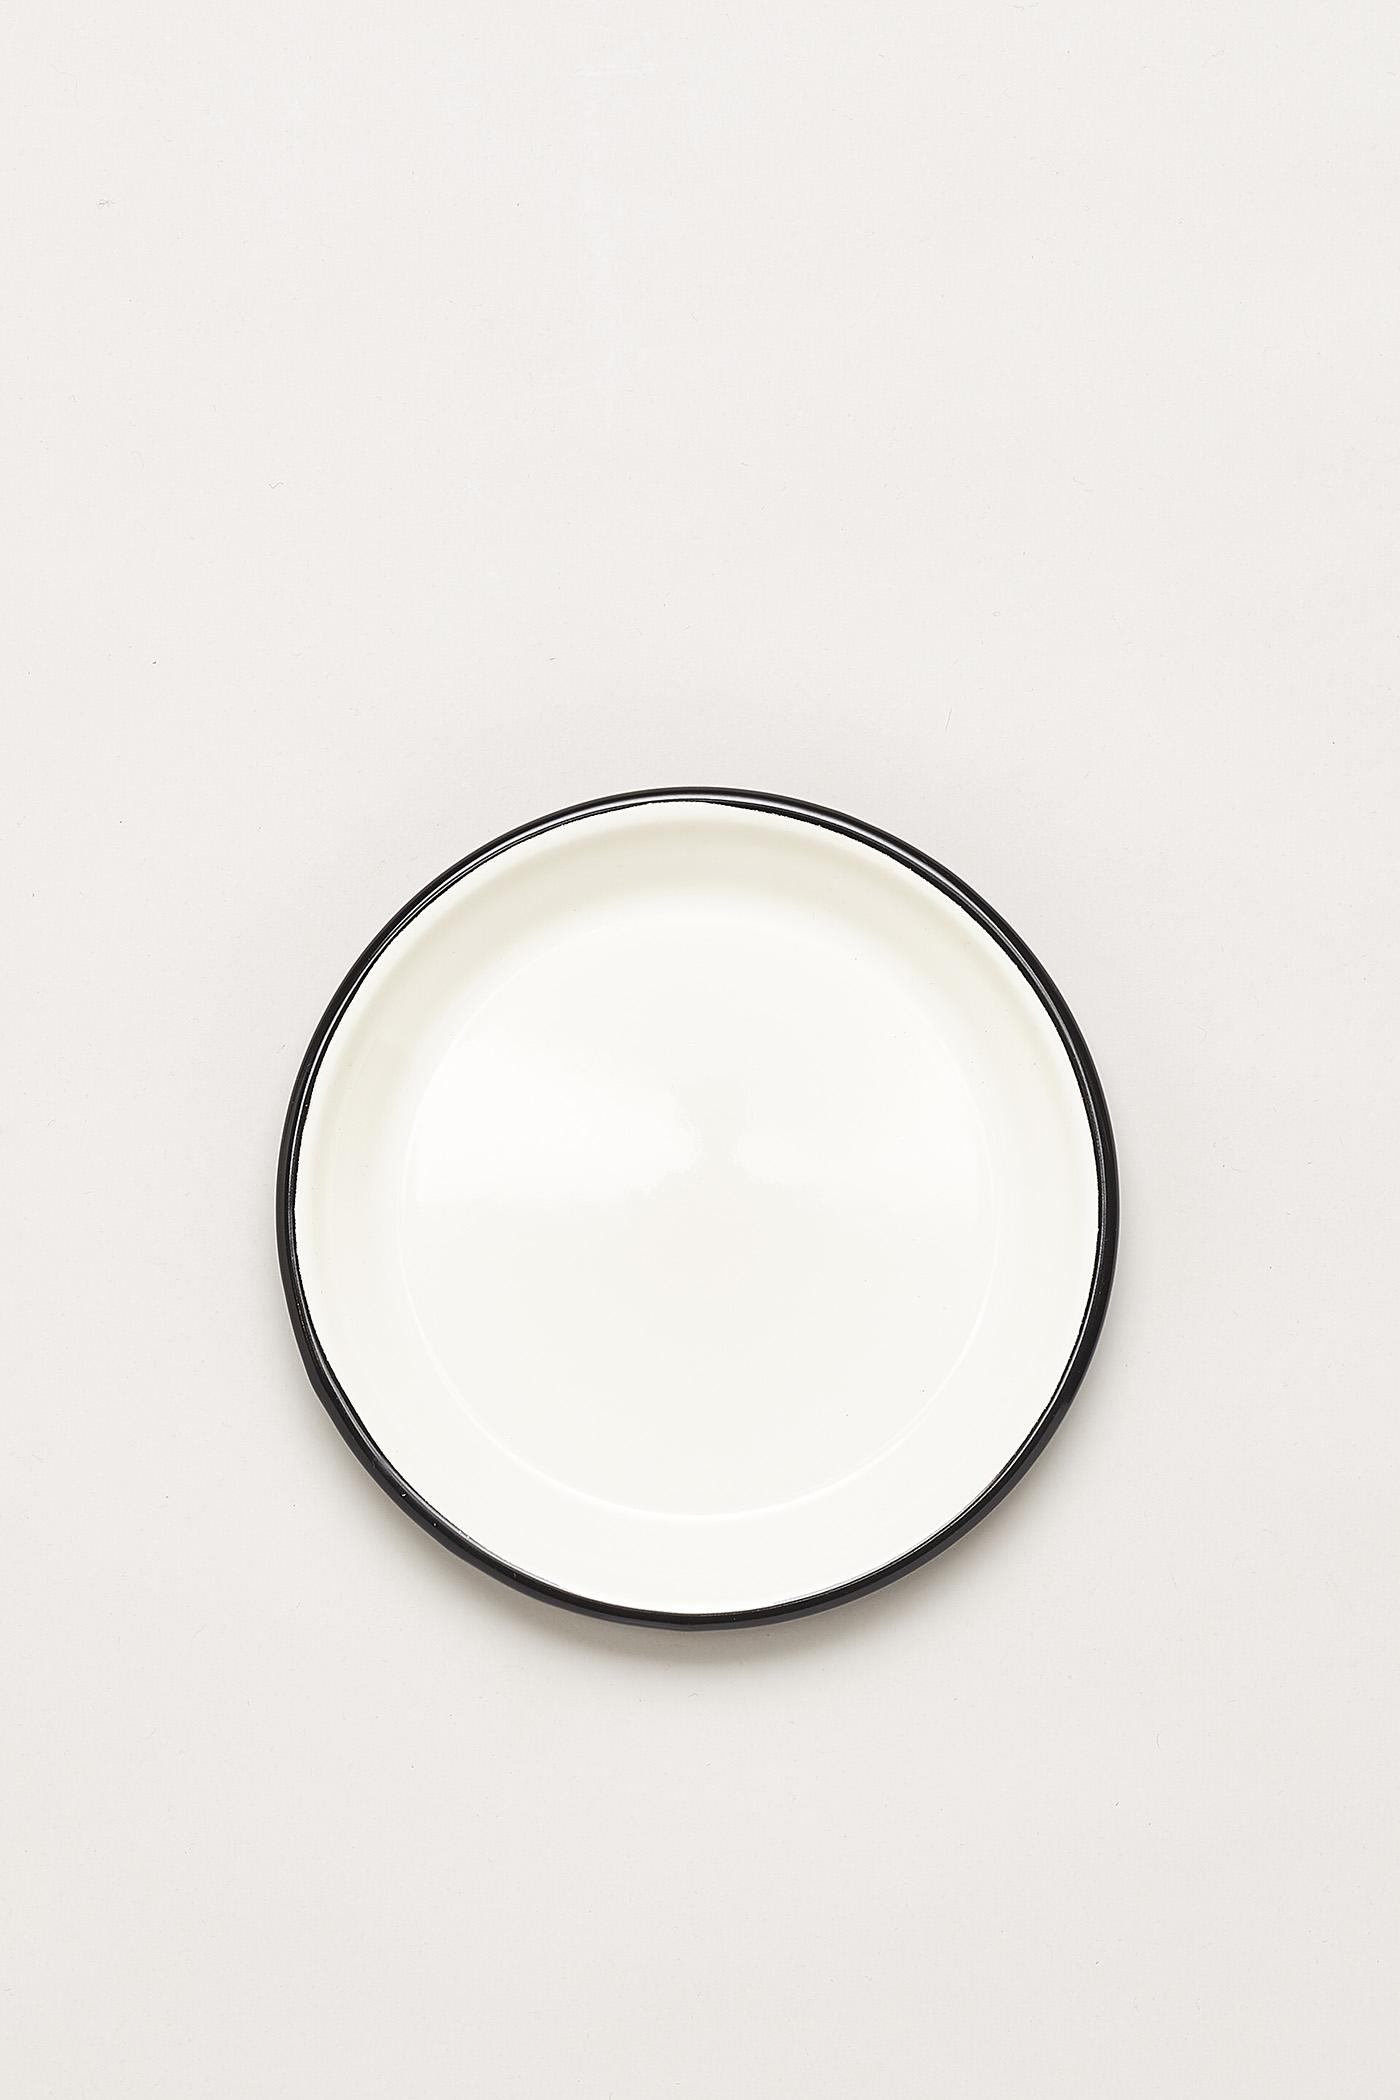 Rolf Enamel Small Plate